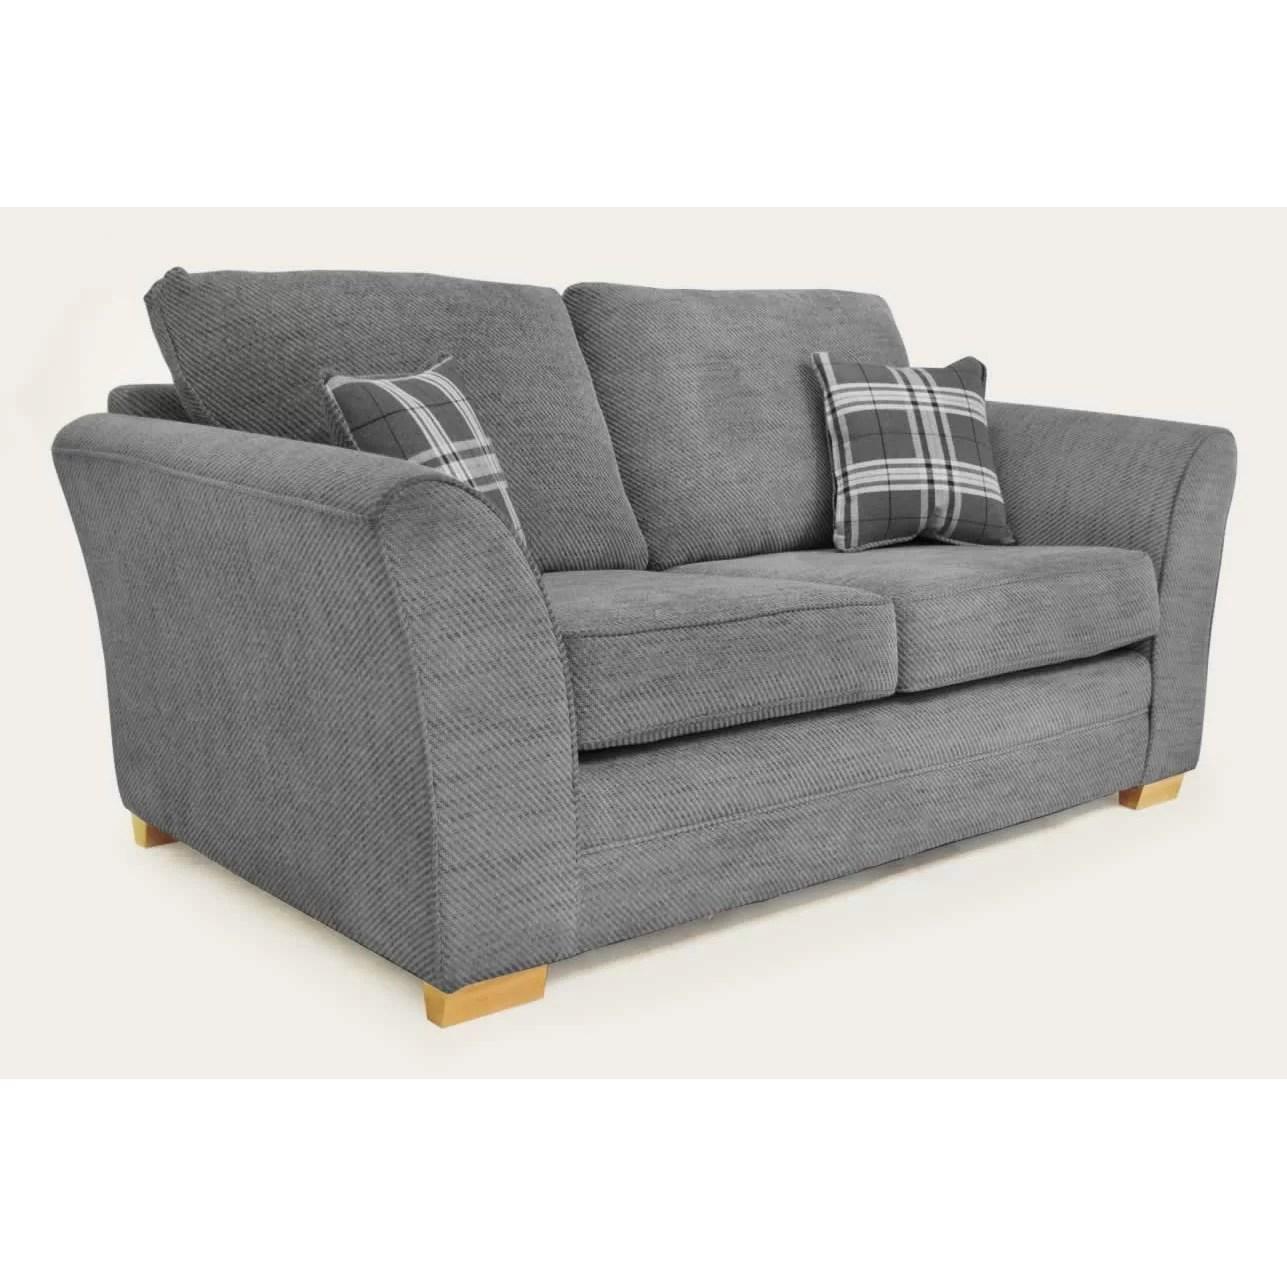 cheap sofas las vegas sofa memory foam cushions factory aprilia 2 seater and reviews wayfair uk